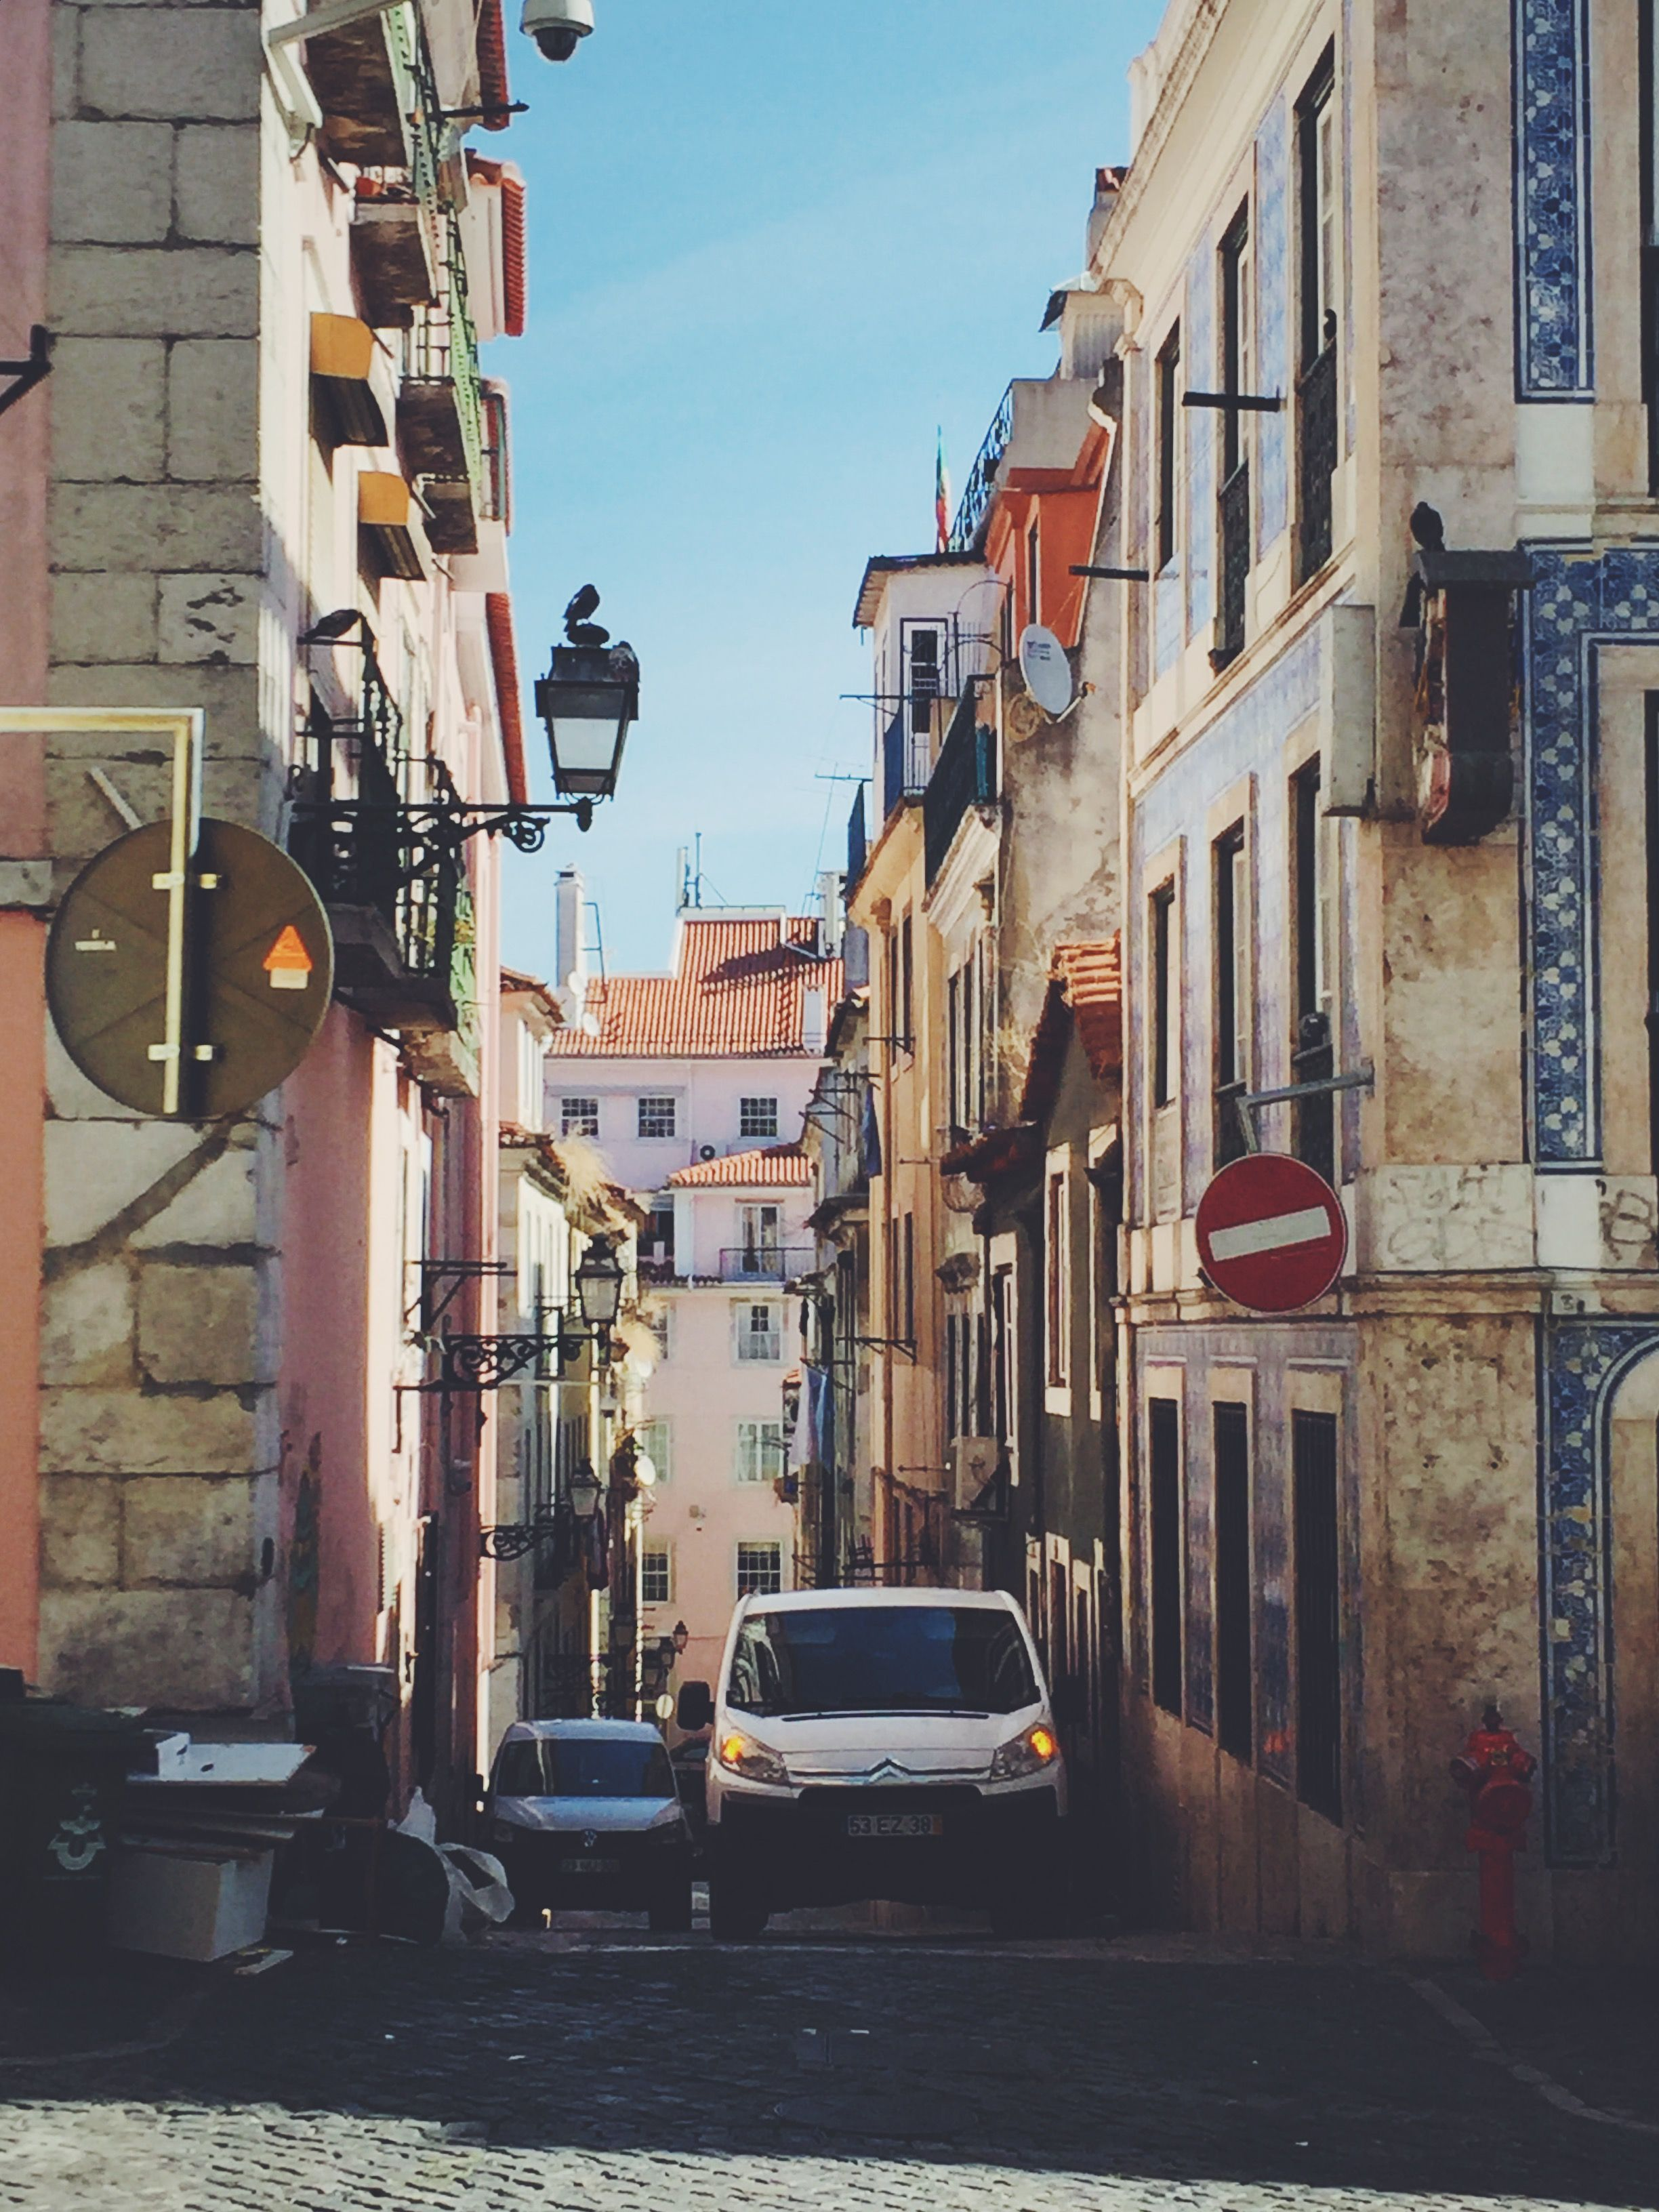 10 things to do in lissabon wanderlust urlaub portugal. Black Bedroom Furniture Sets. Home Design Ideas